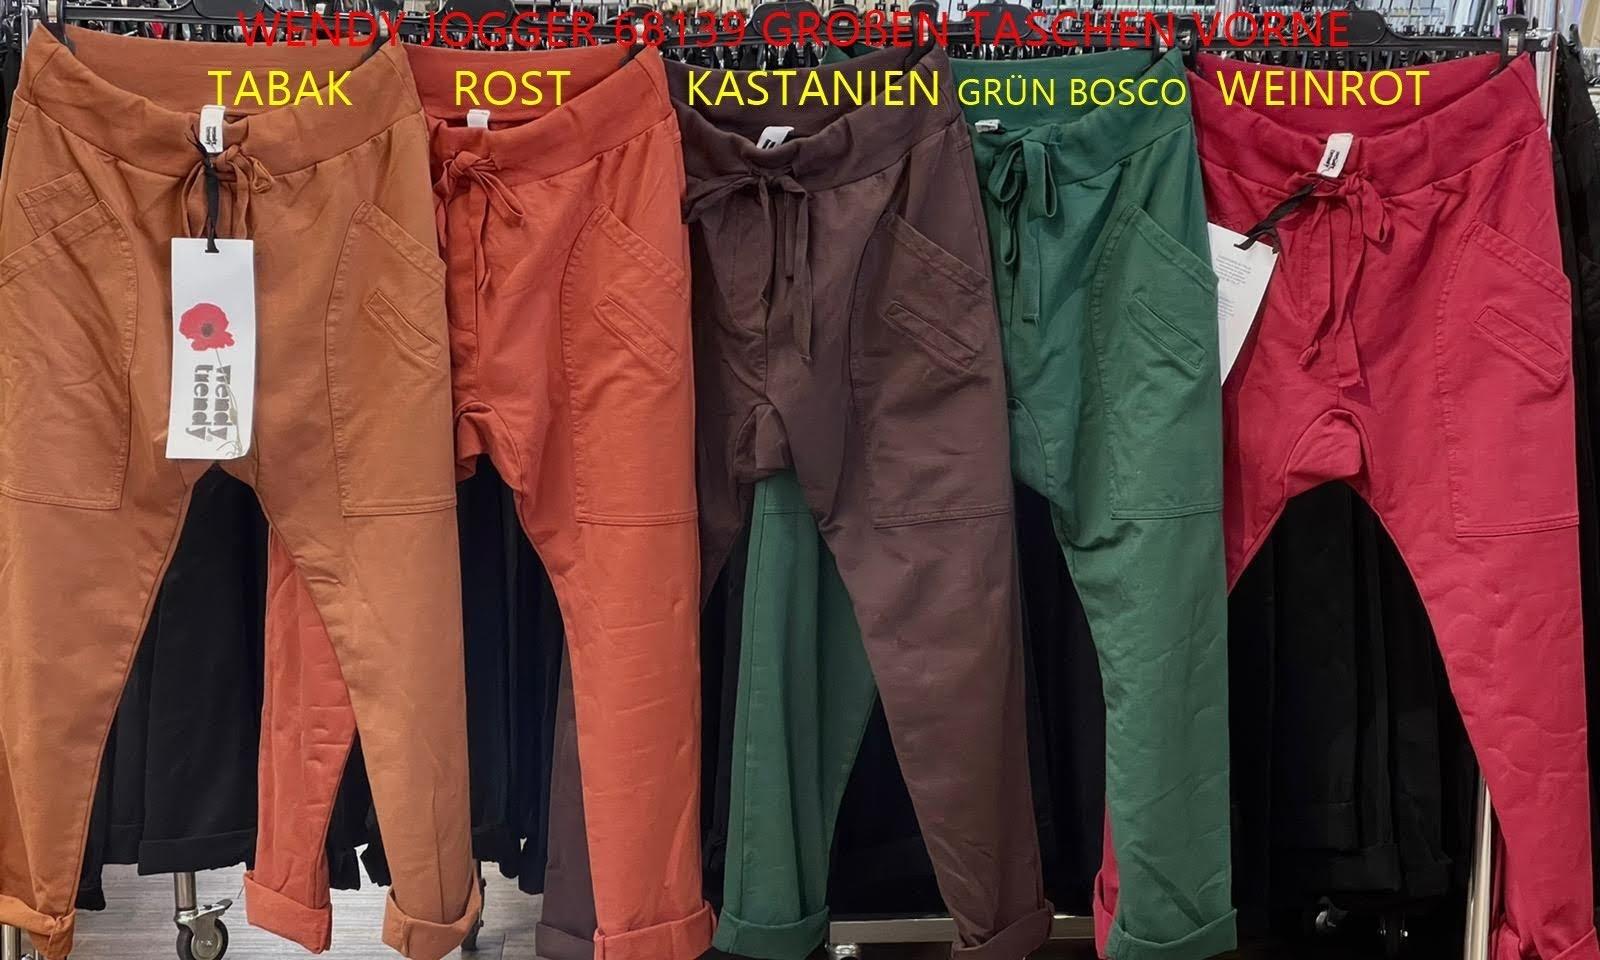 WENDY TRENDY WENDY TRENDY Joggingbyxor  66055/68139 - Grün Bosco 28 med patchfickor.